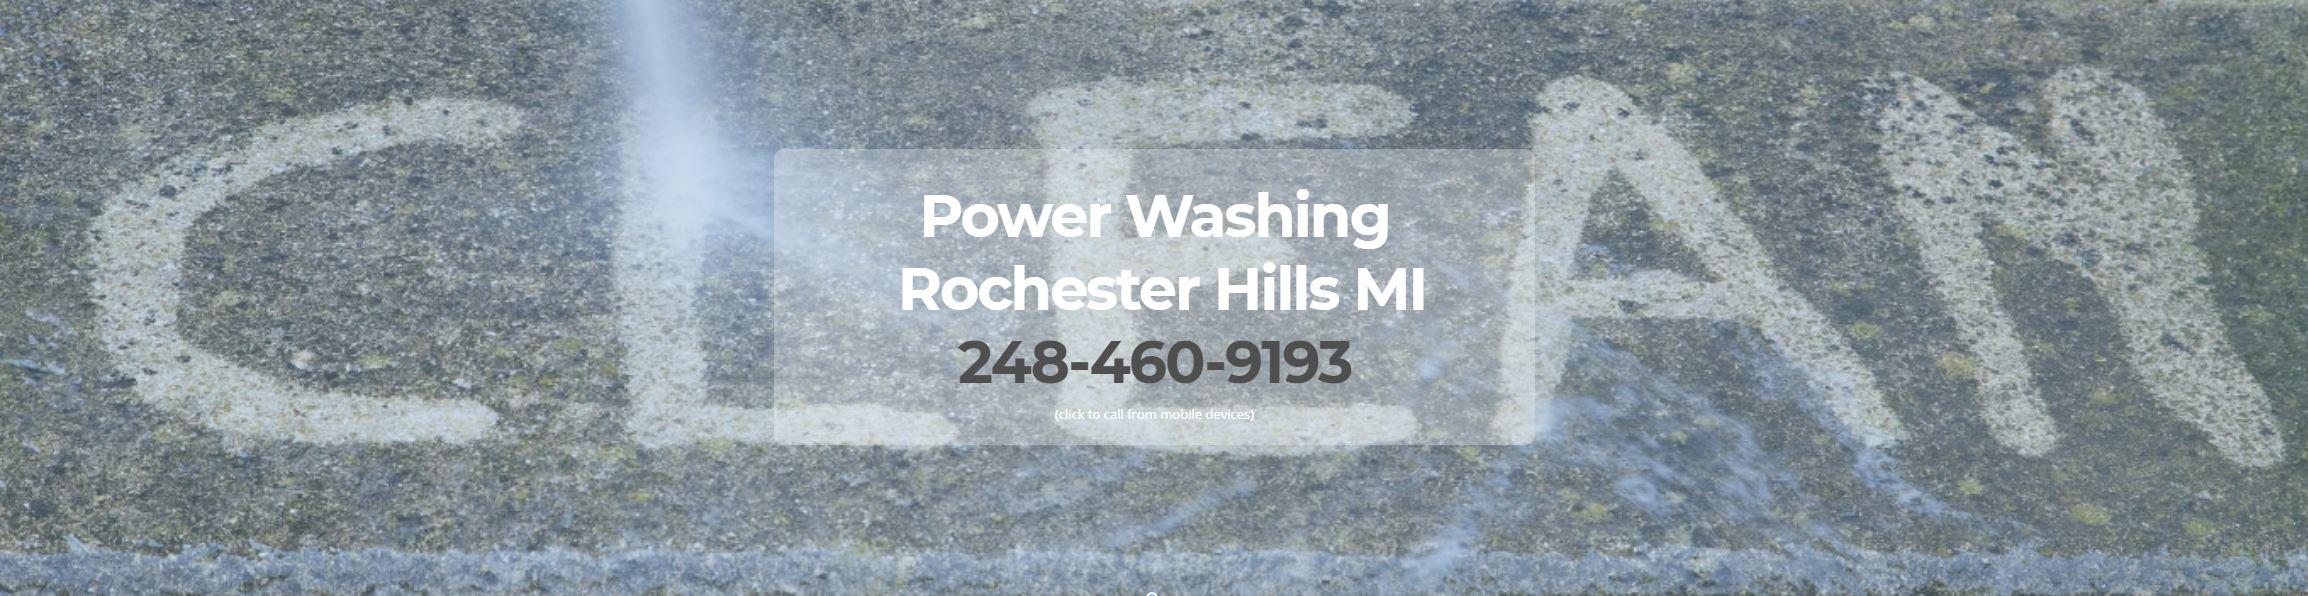 Power Wash Cover.JPG